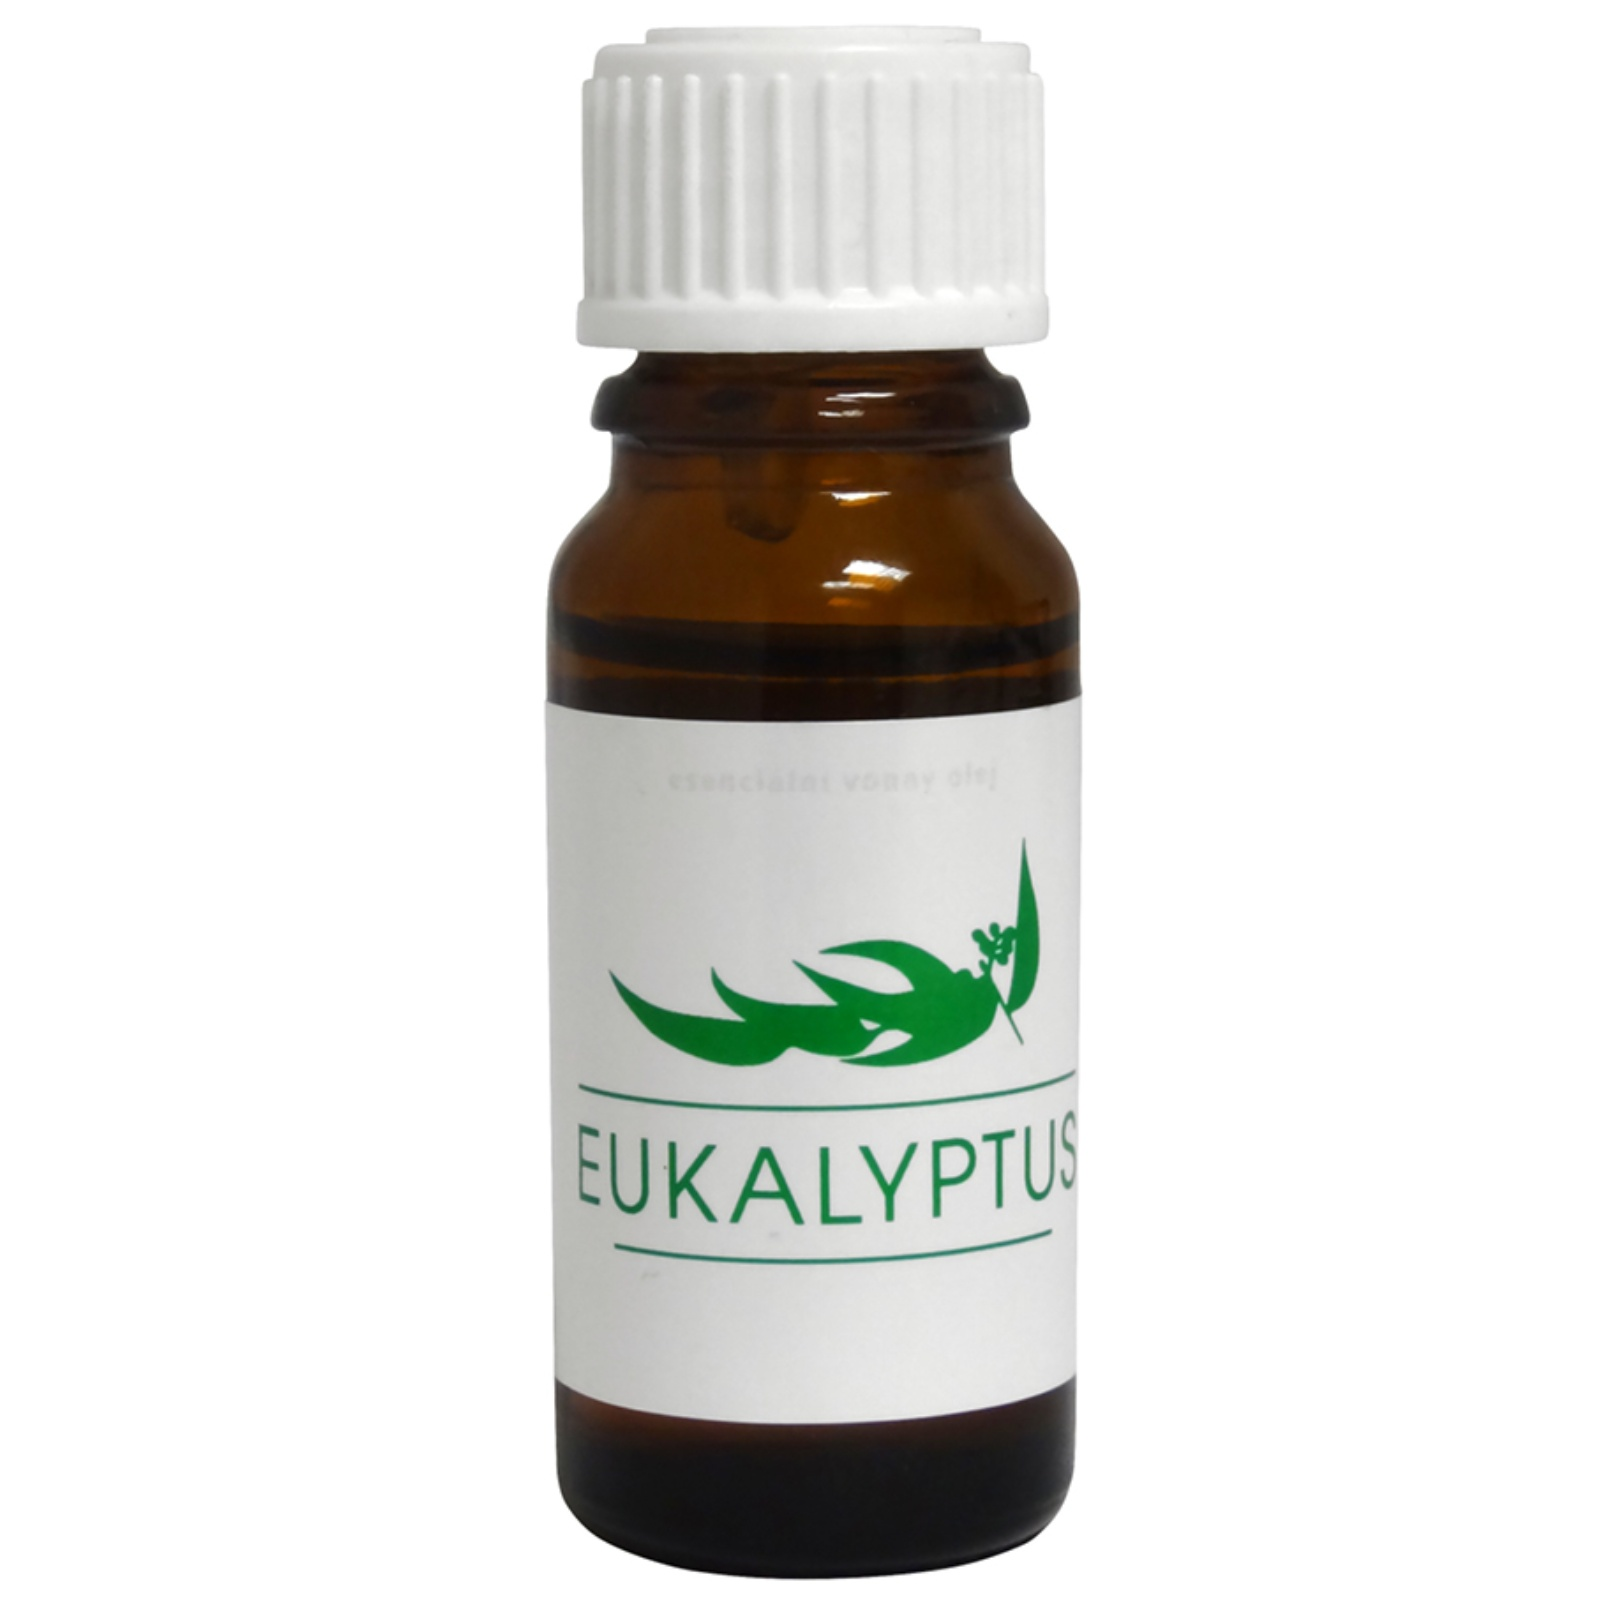 Esenciální saunový vonný olej HANSCRAFT 10ml - Eukalyptus